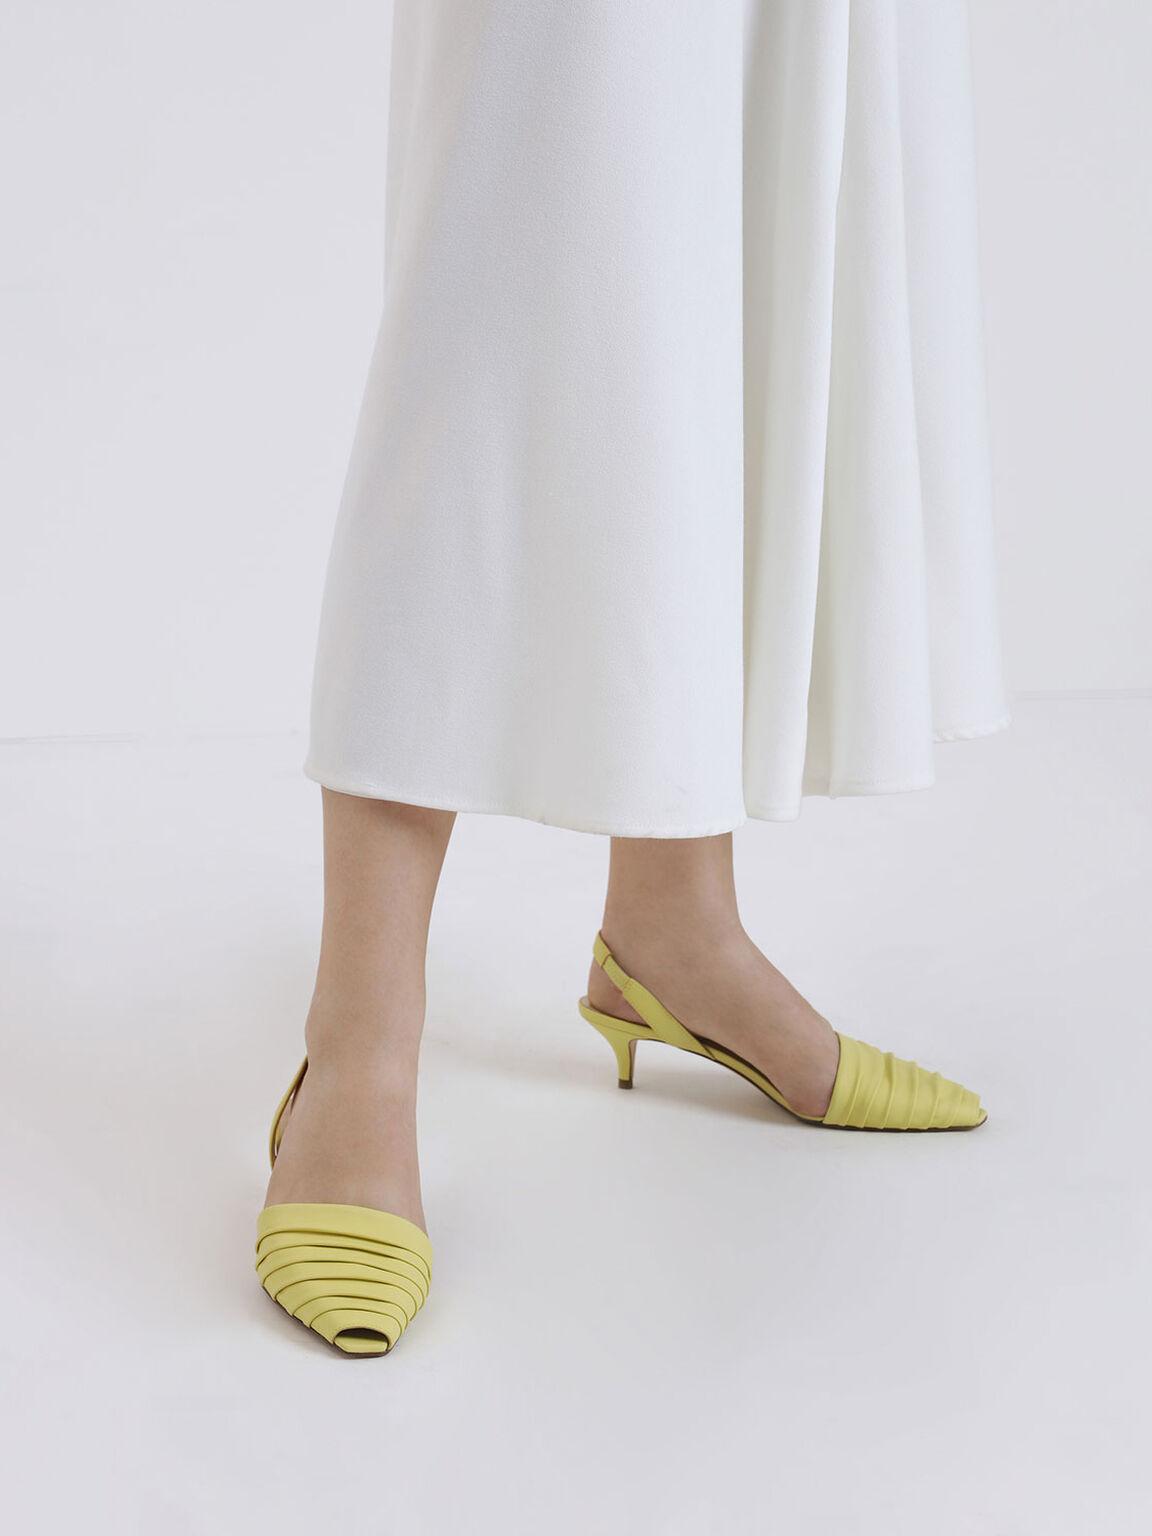 Ruched Peep Toe Slingback Heels, Yellow, hi-res